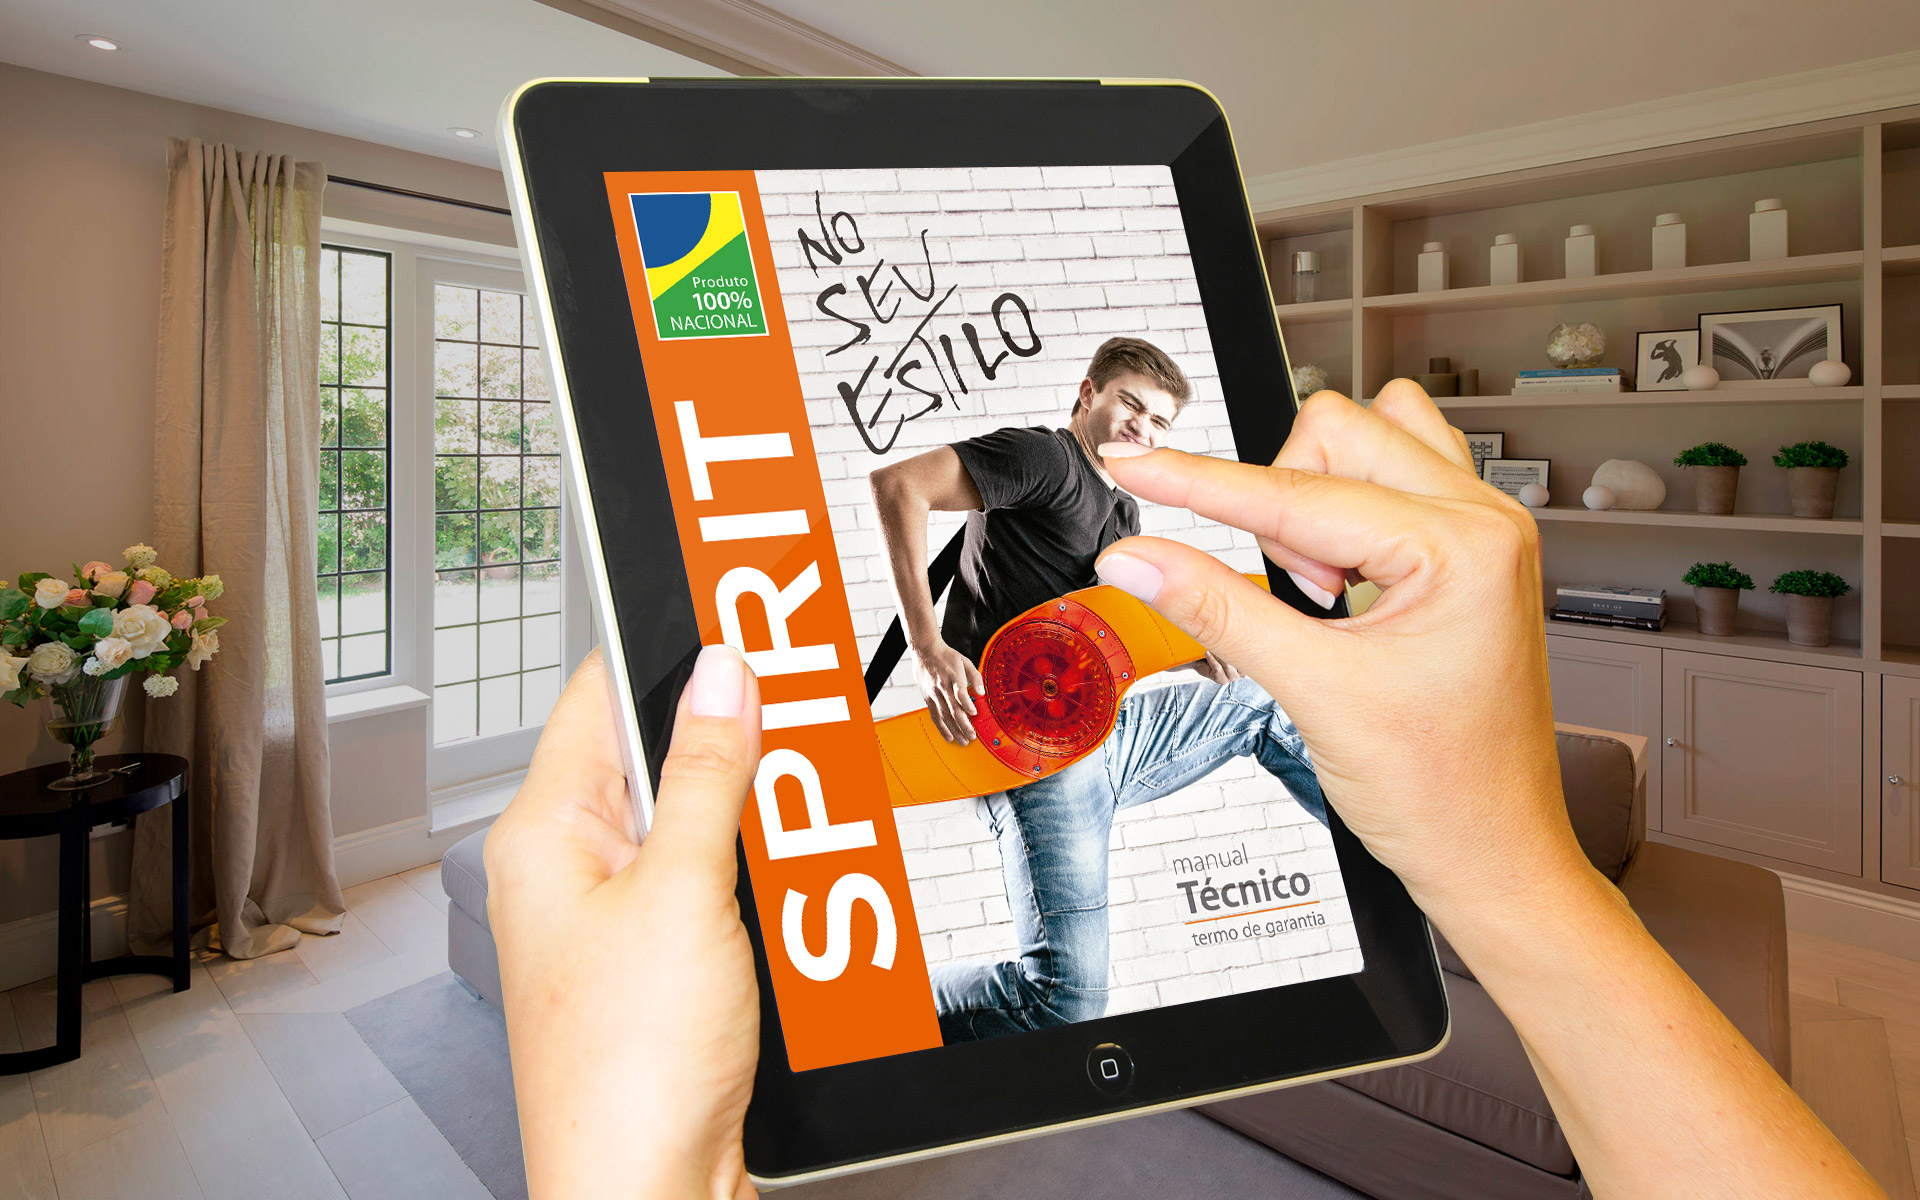 ventilador de teto Spirit - Blog Myspirit - capa blog - manual do ventilador de teto